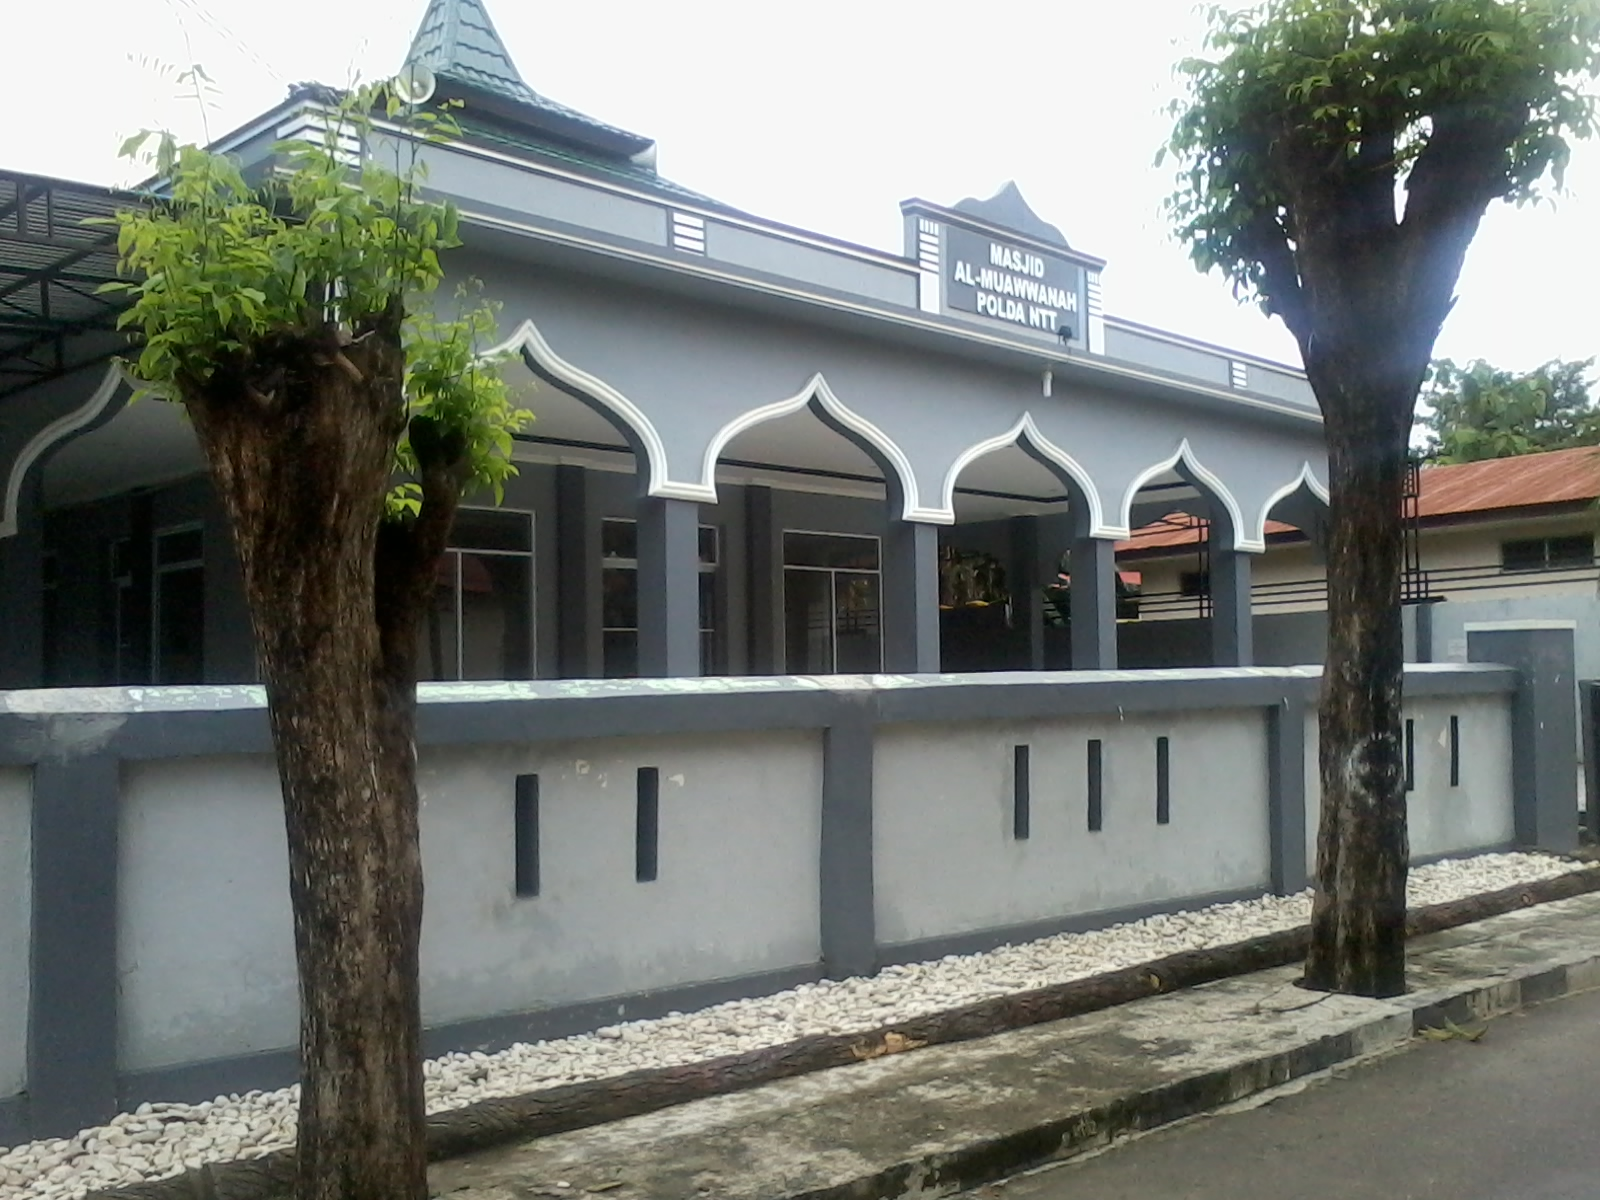 Masjid Al Muawwanah Polda Ntt Haidi Barasa 2014 02 14